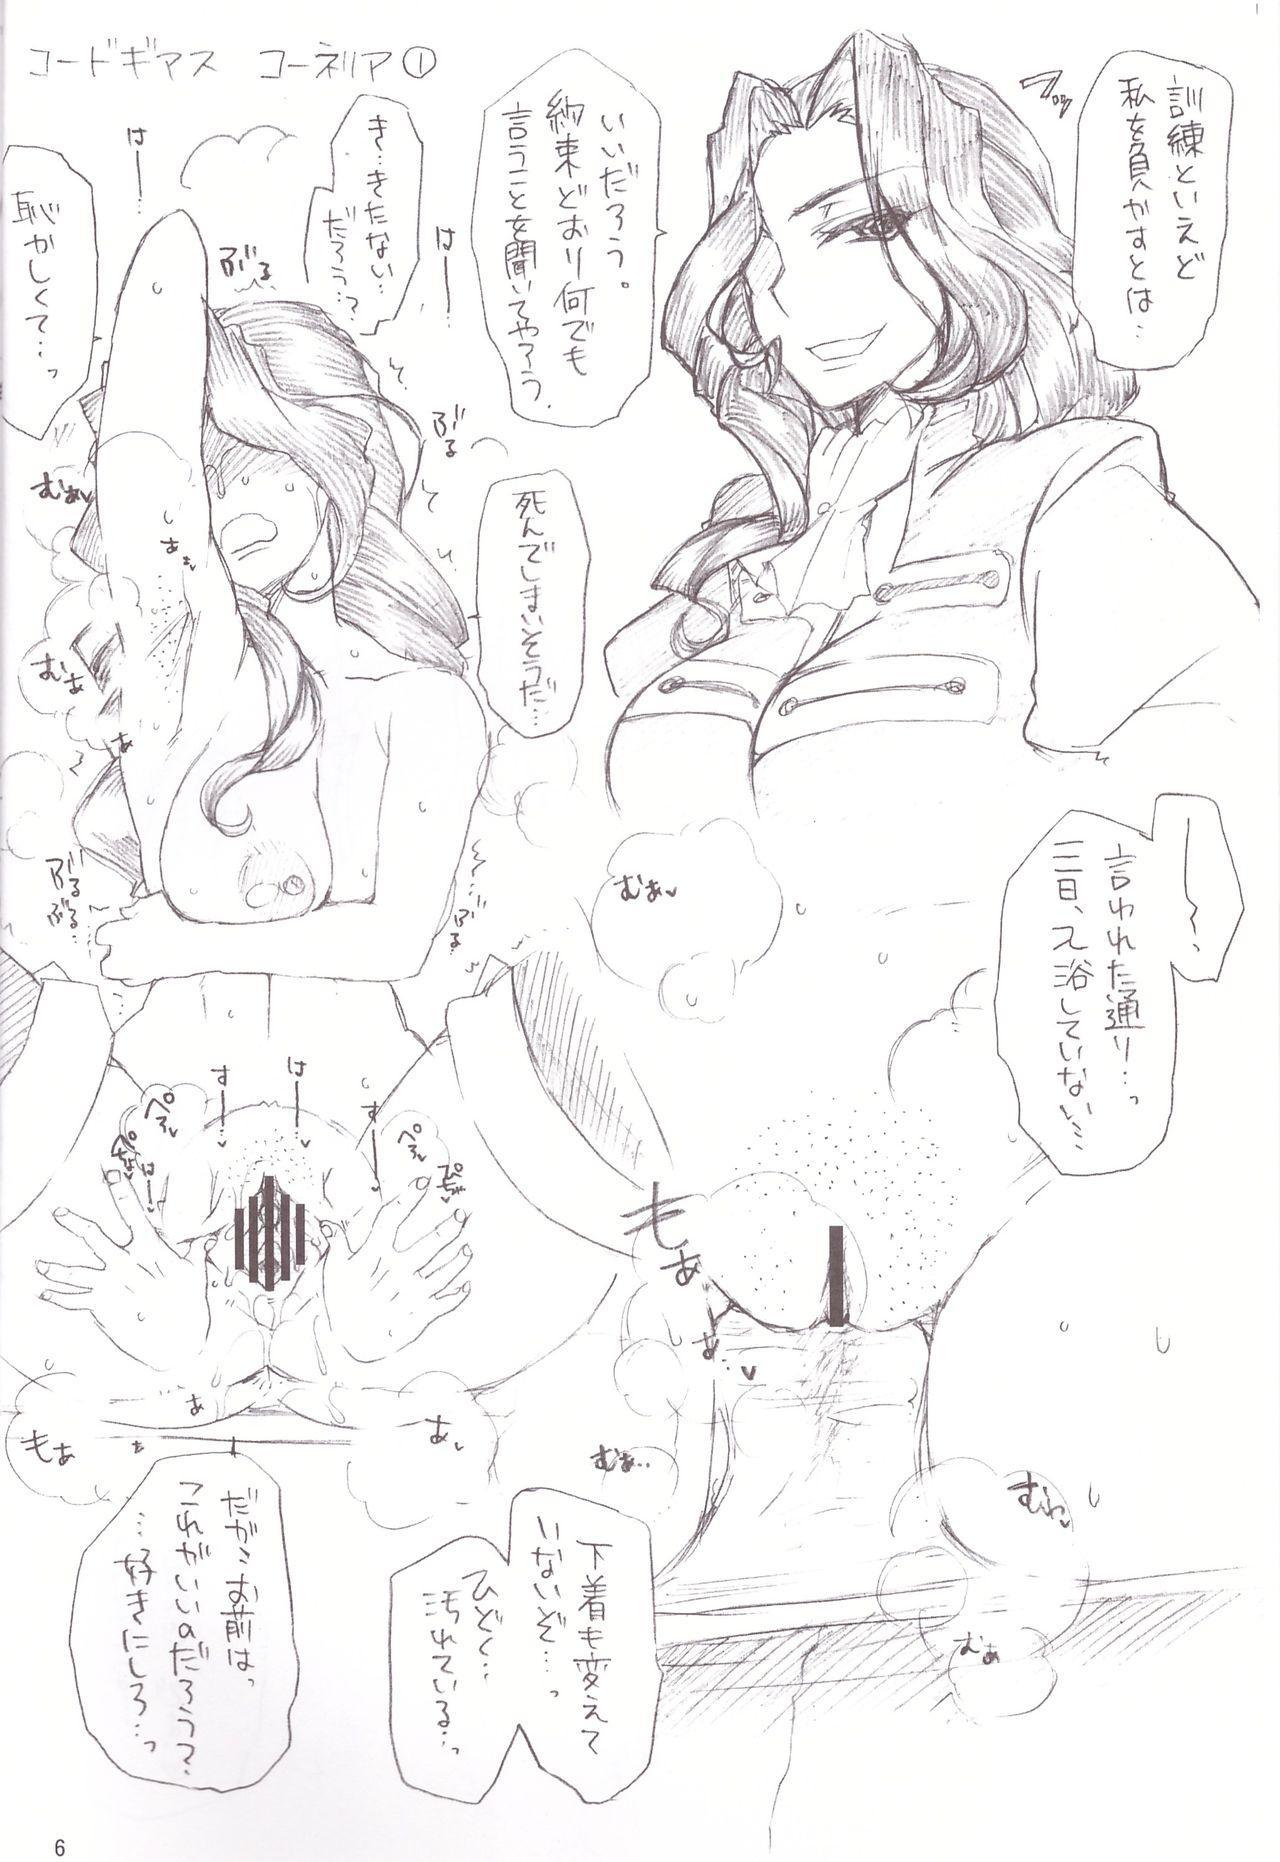 Hentai Fetish's 2 5